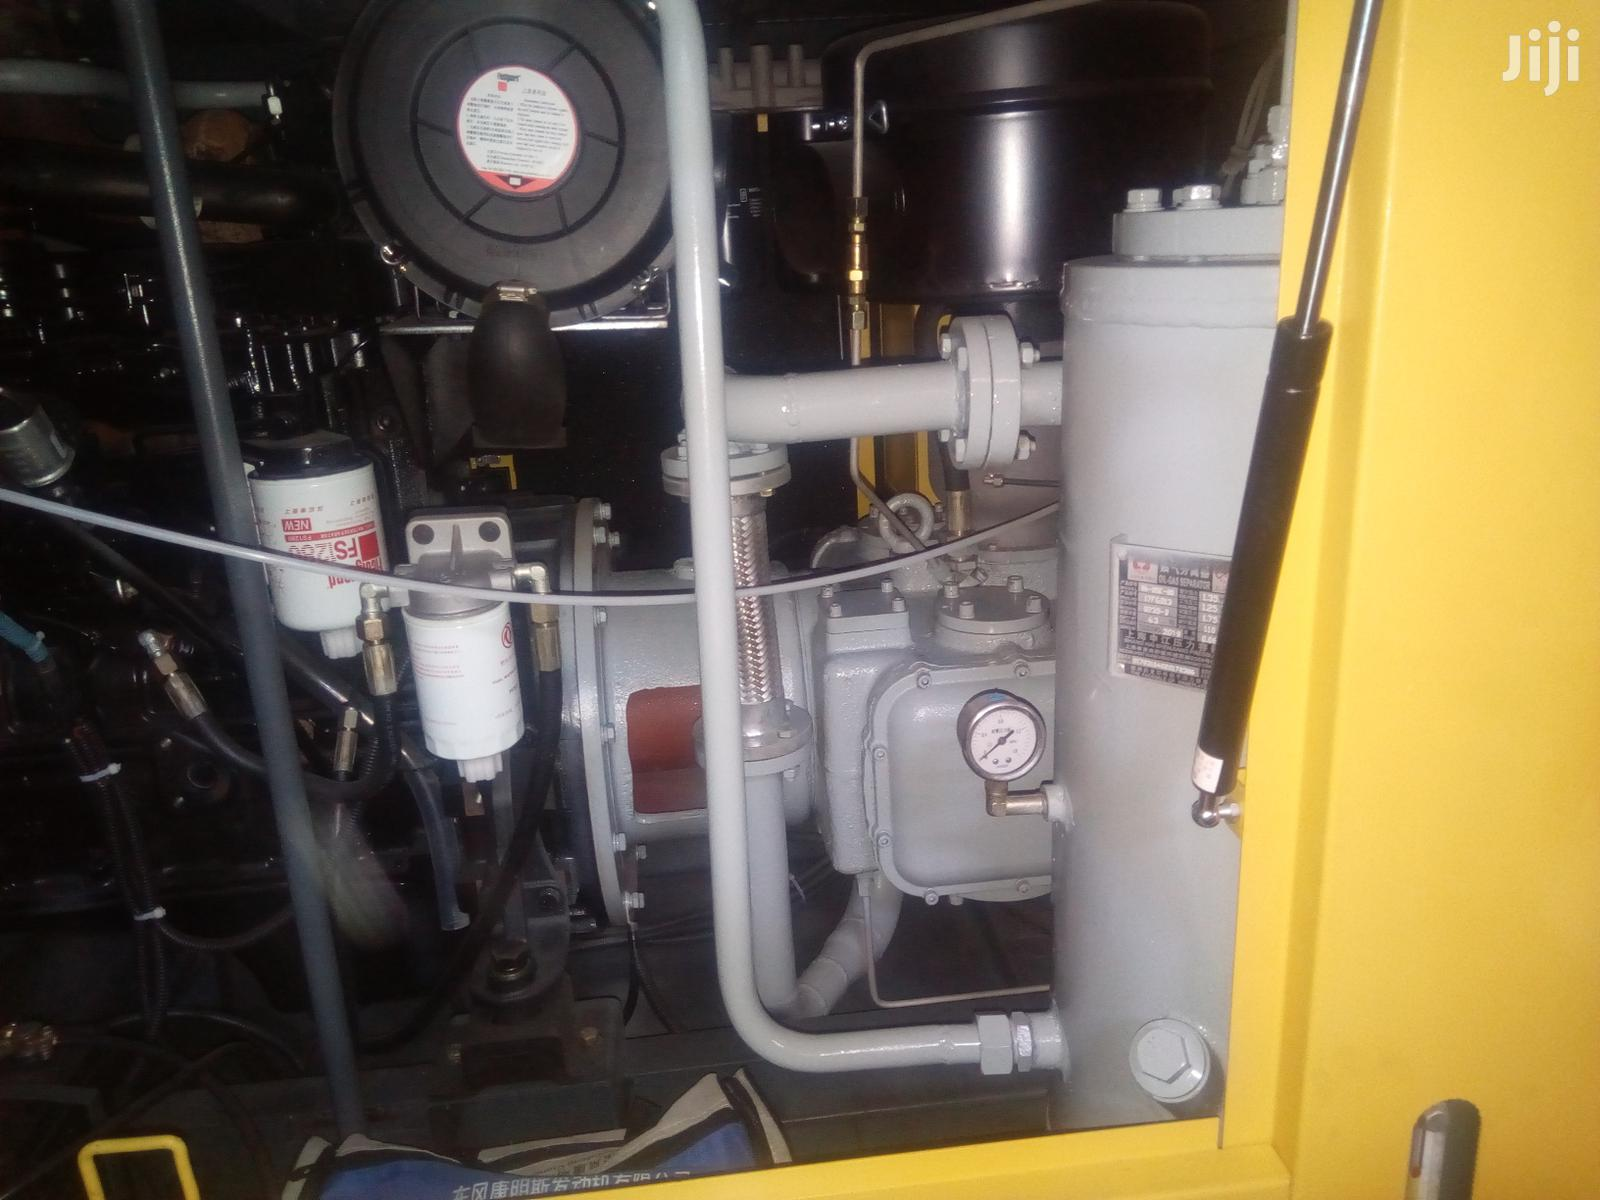 Engine Compressor 4 Slinder | Electrical Equipment for sale in Ojo, Lagos State, Nigeria